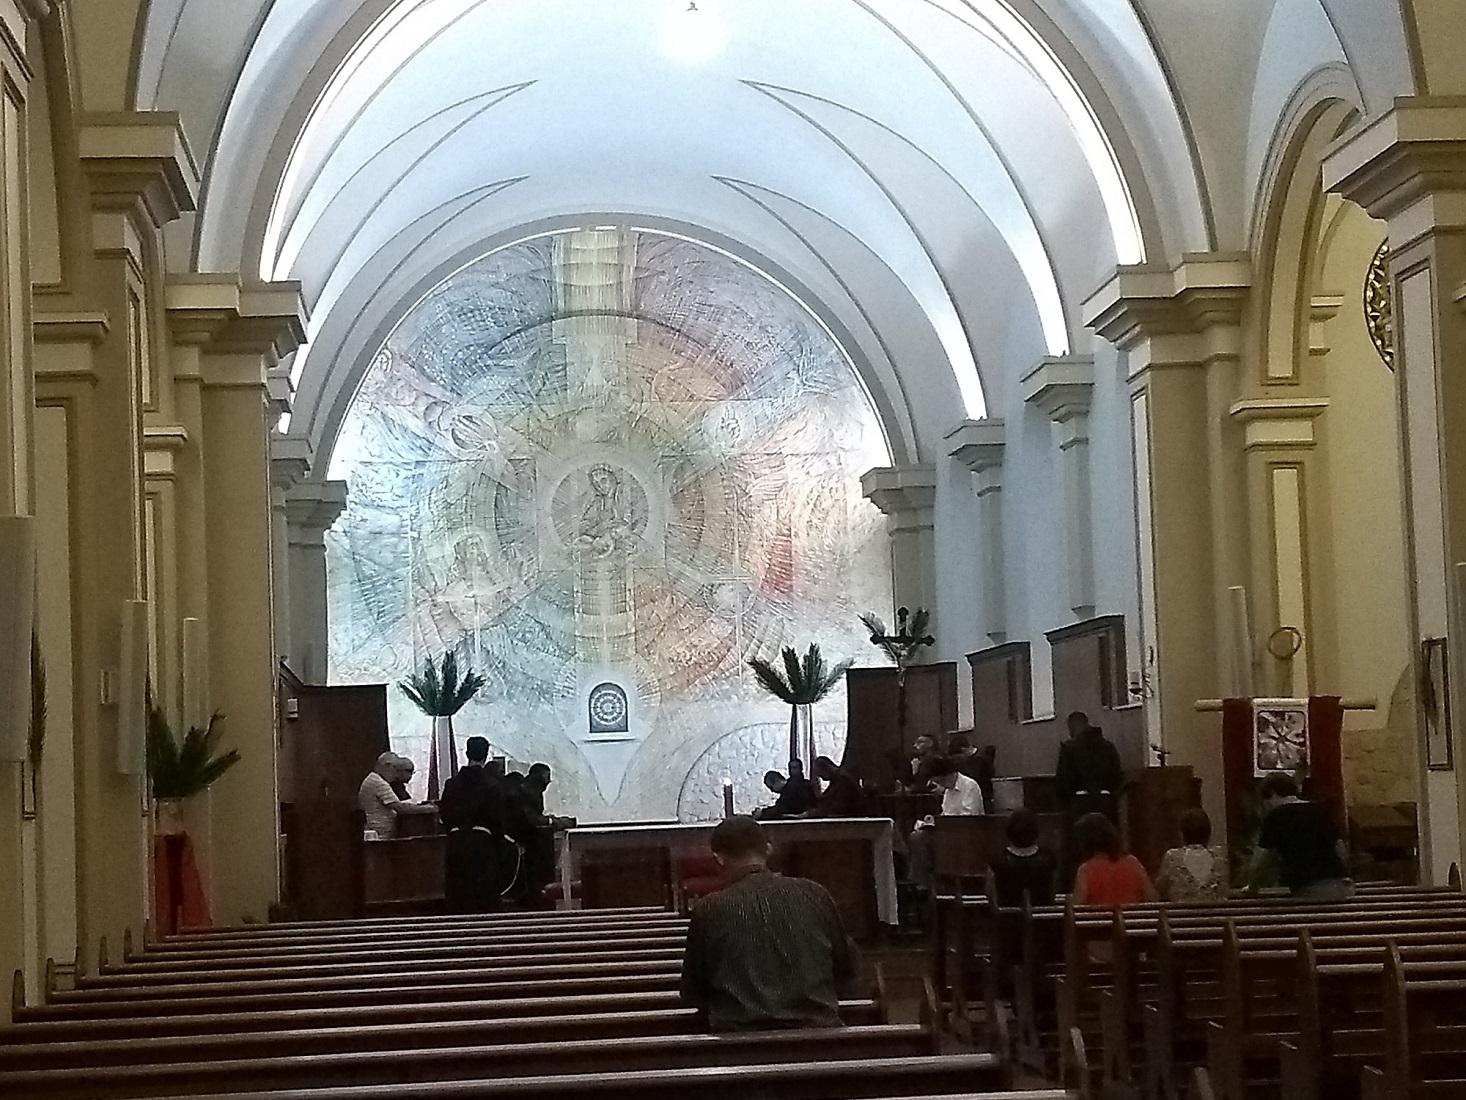 Rodeio Santa Catarina Cidade dos Anjos Igreja Matriz Et Incarnatus Est